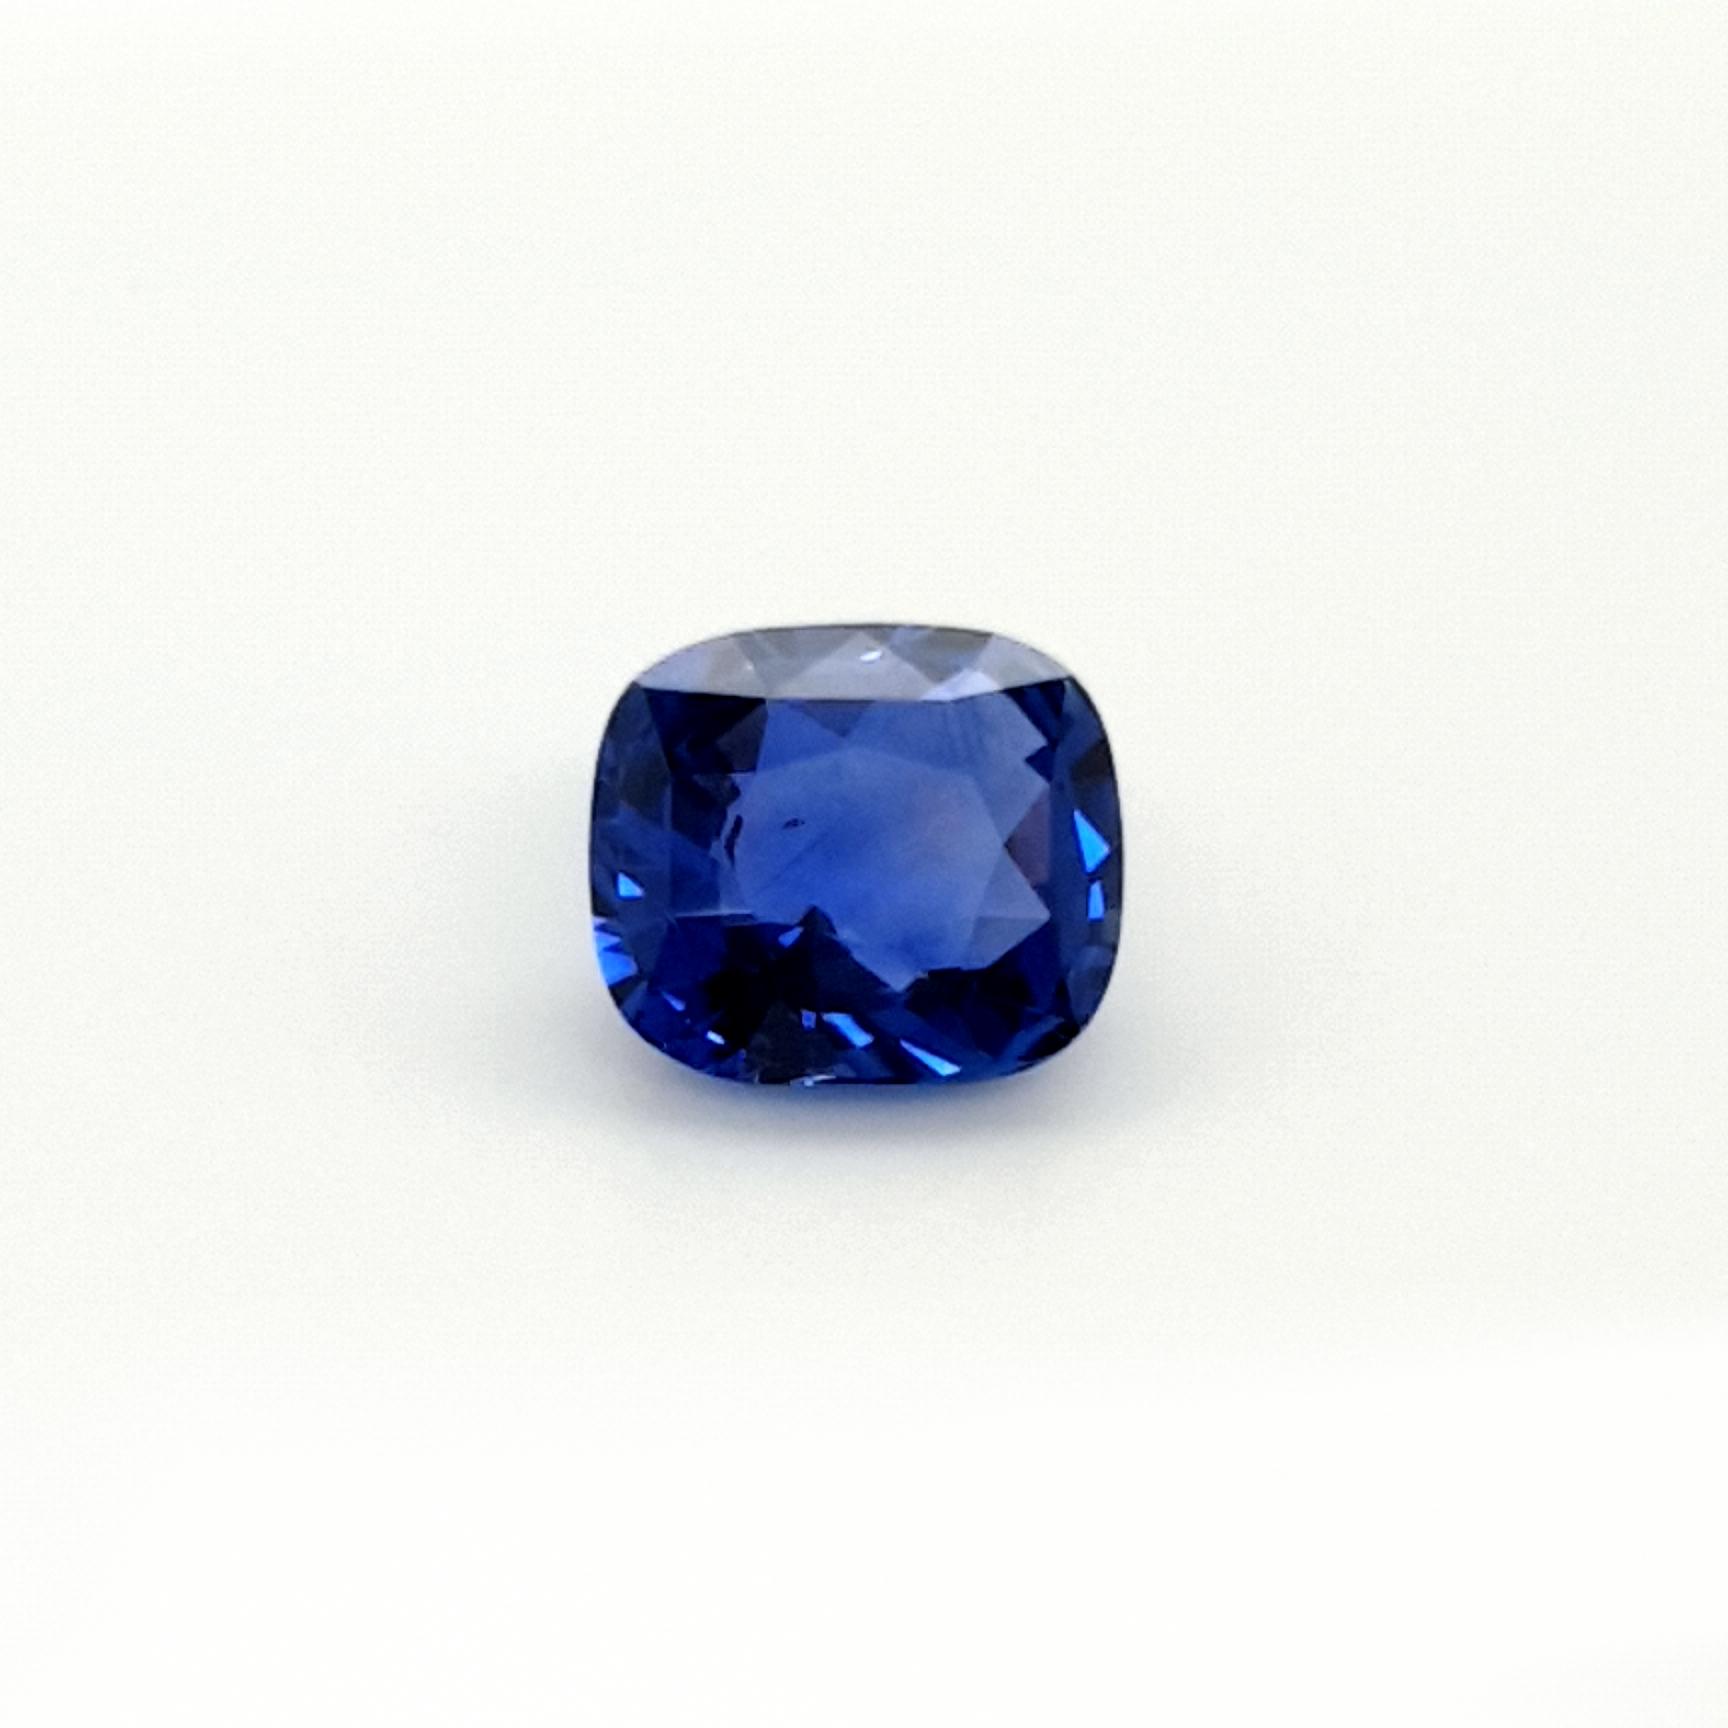 4,01ct. Sapphire Ceylon cert. SAF19D4 ClaudiaHamann__2021-06-02-18-23-24